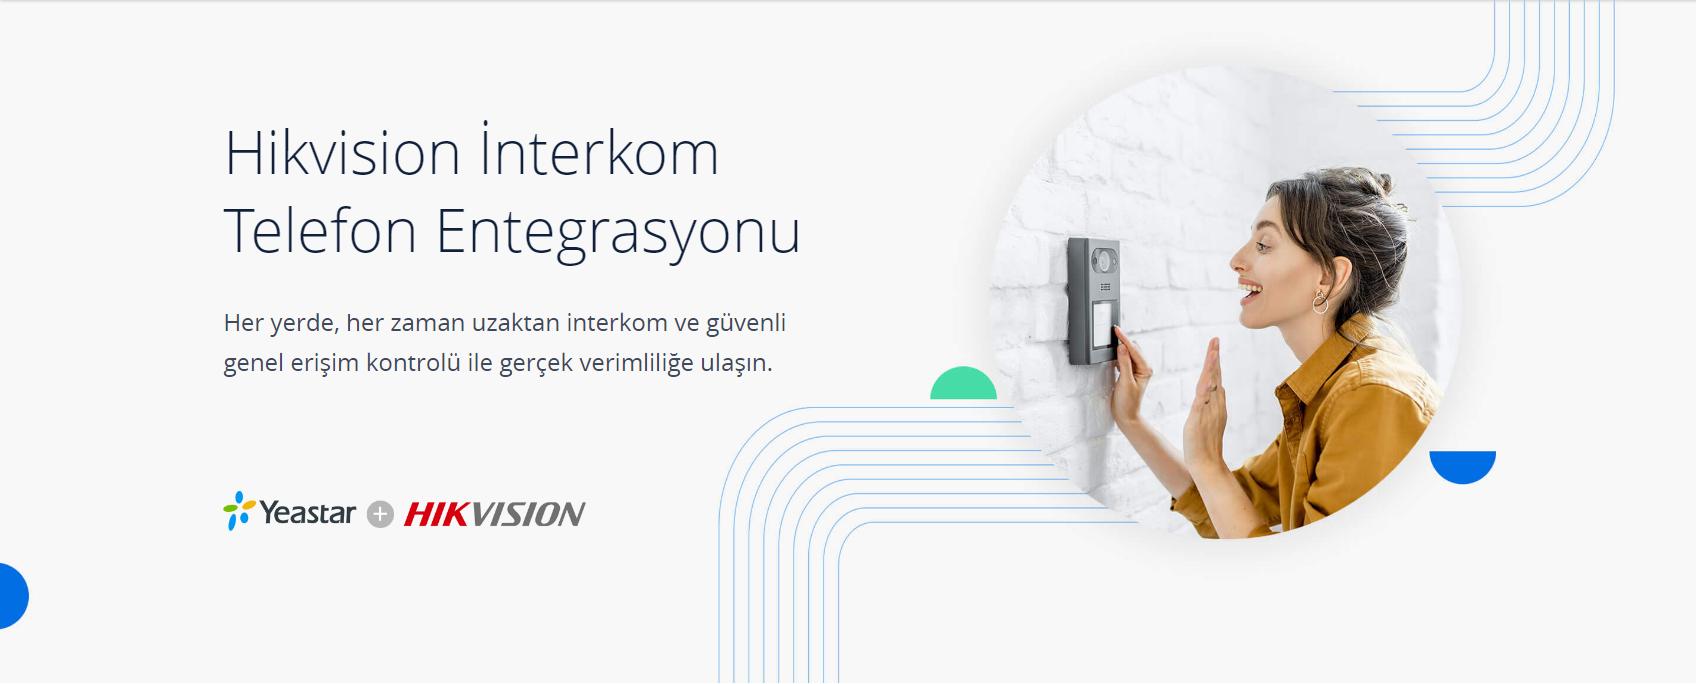 Hikvision Yeastar IP interkom